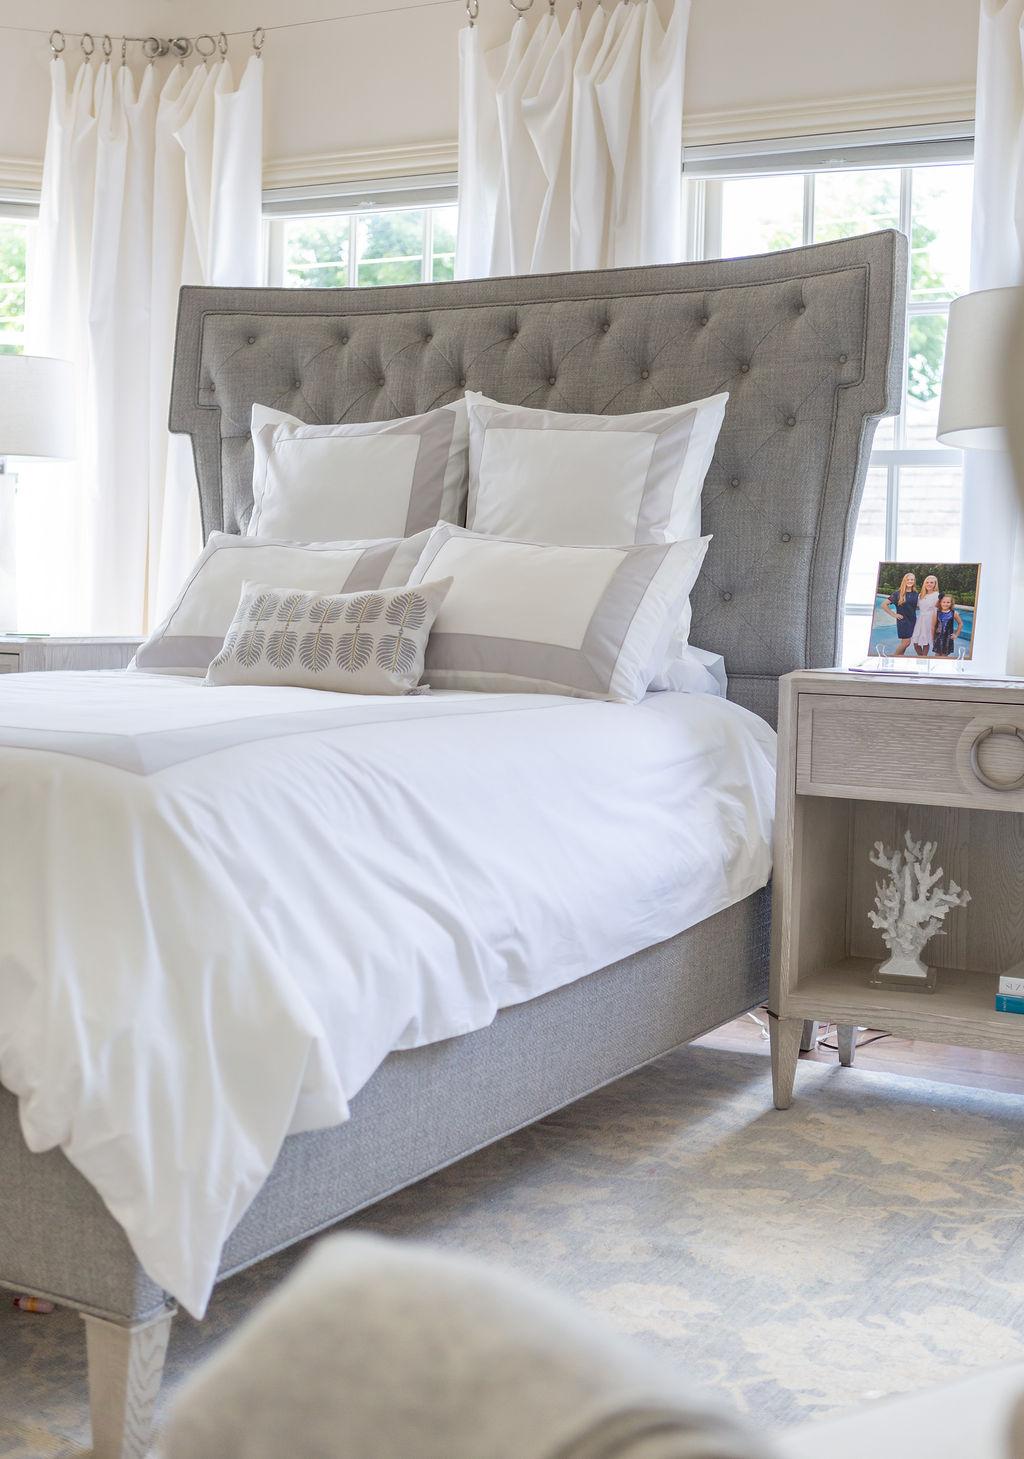 Bernhardt Domaine Blanc Bed